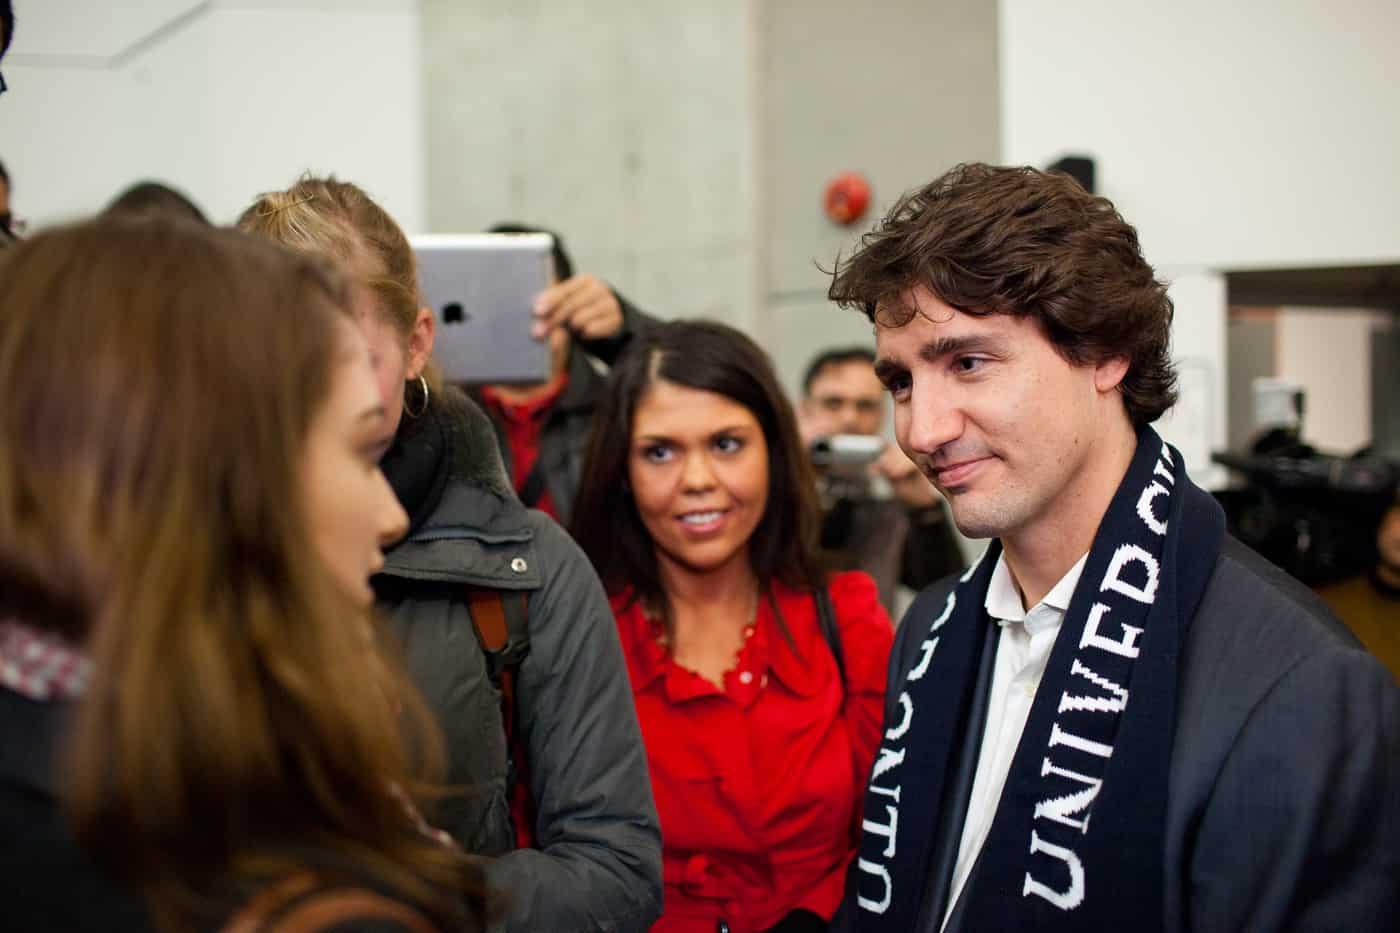 Trudeau visits University of Toronto campus